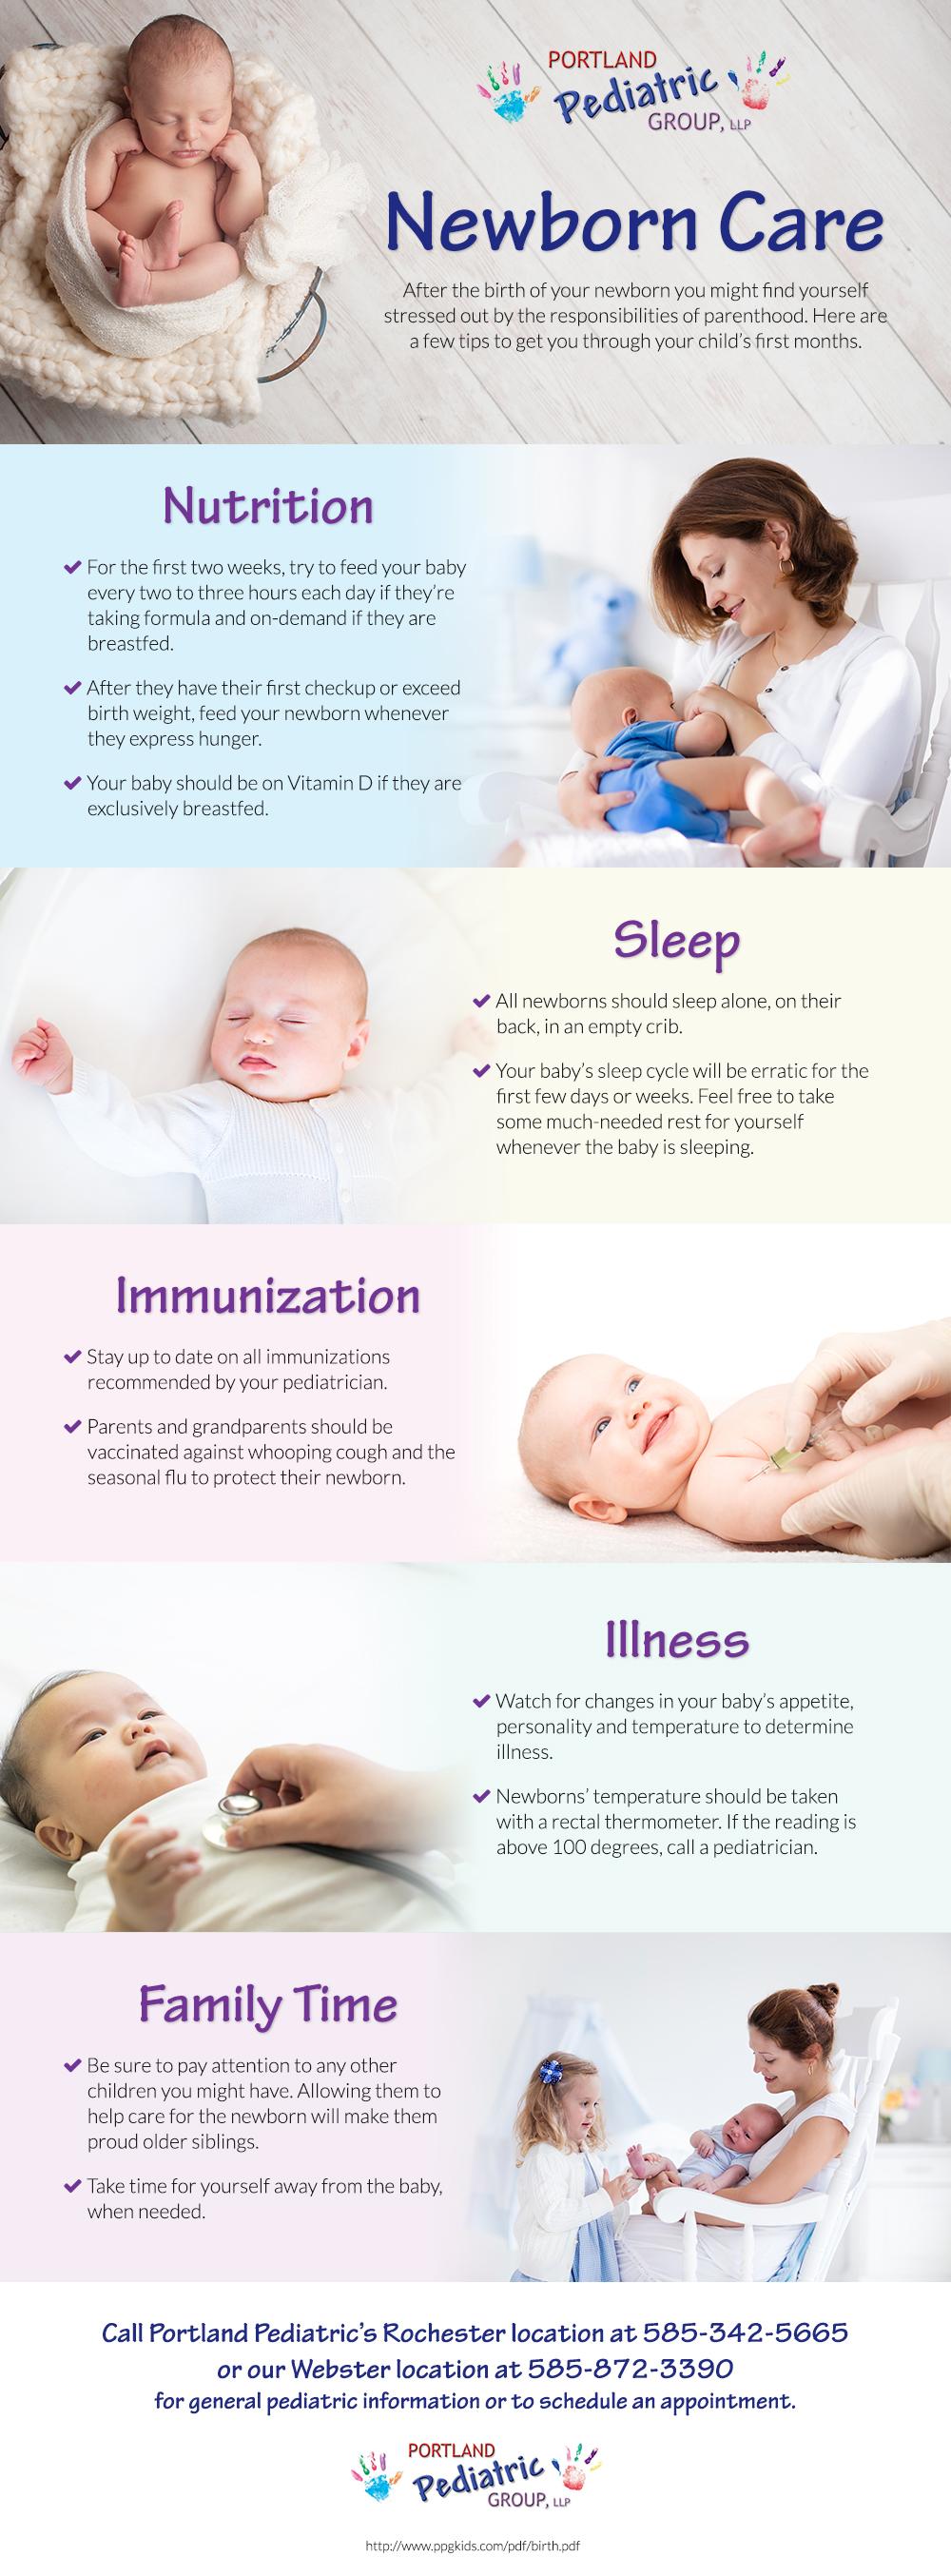 Newborn | Portland Pediatric Group